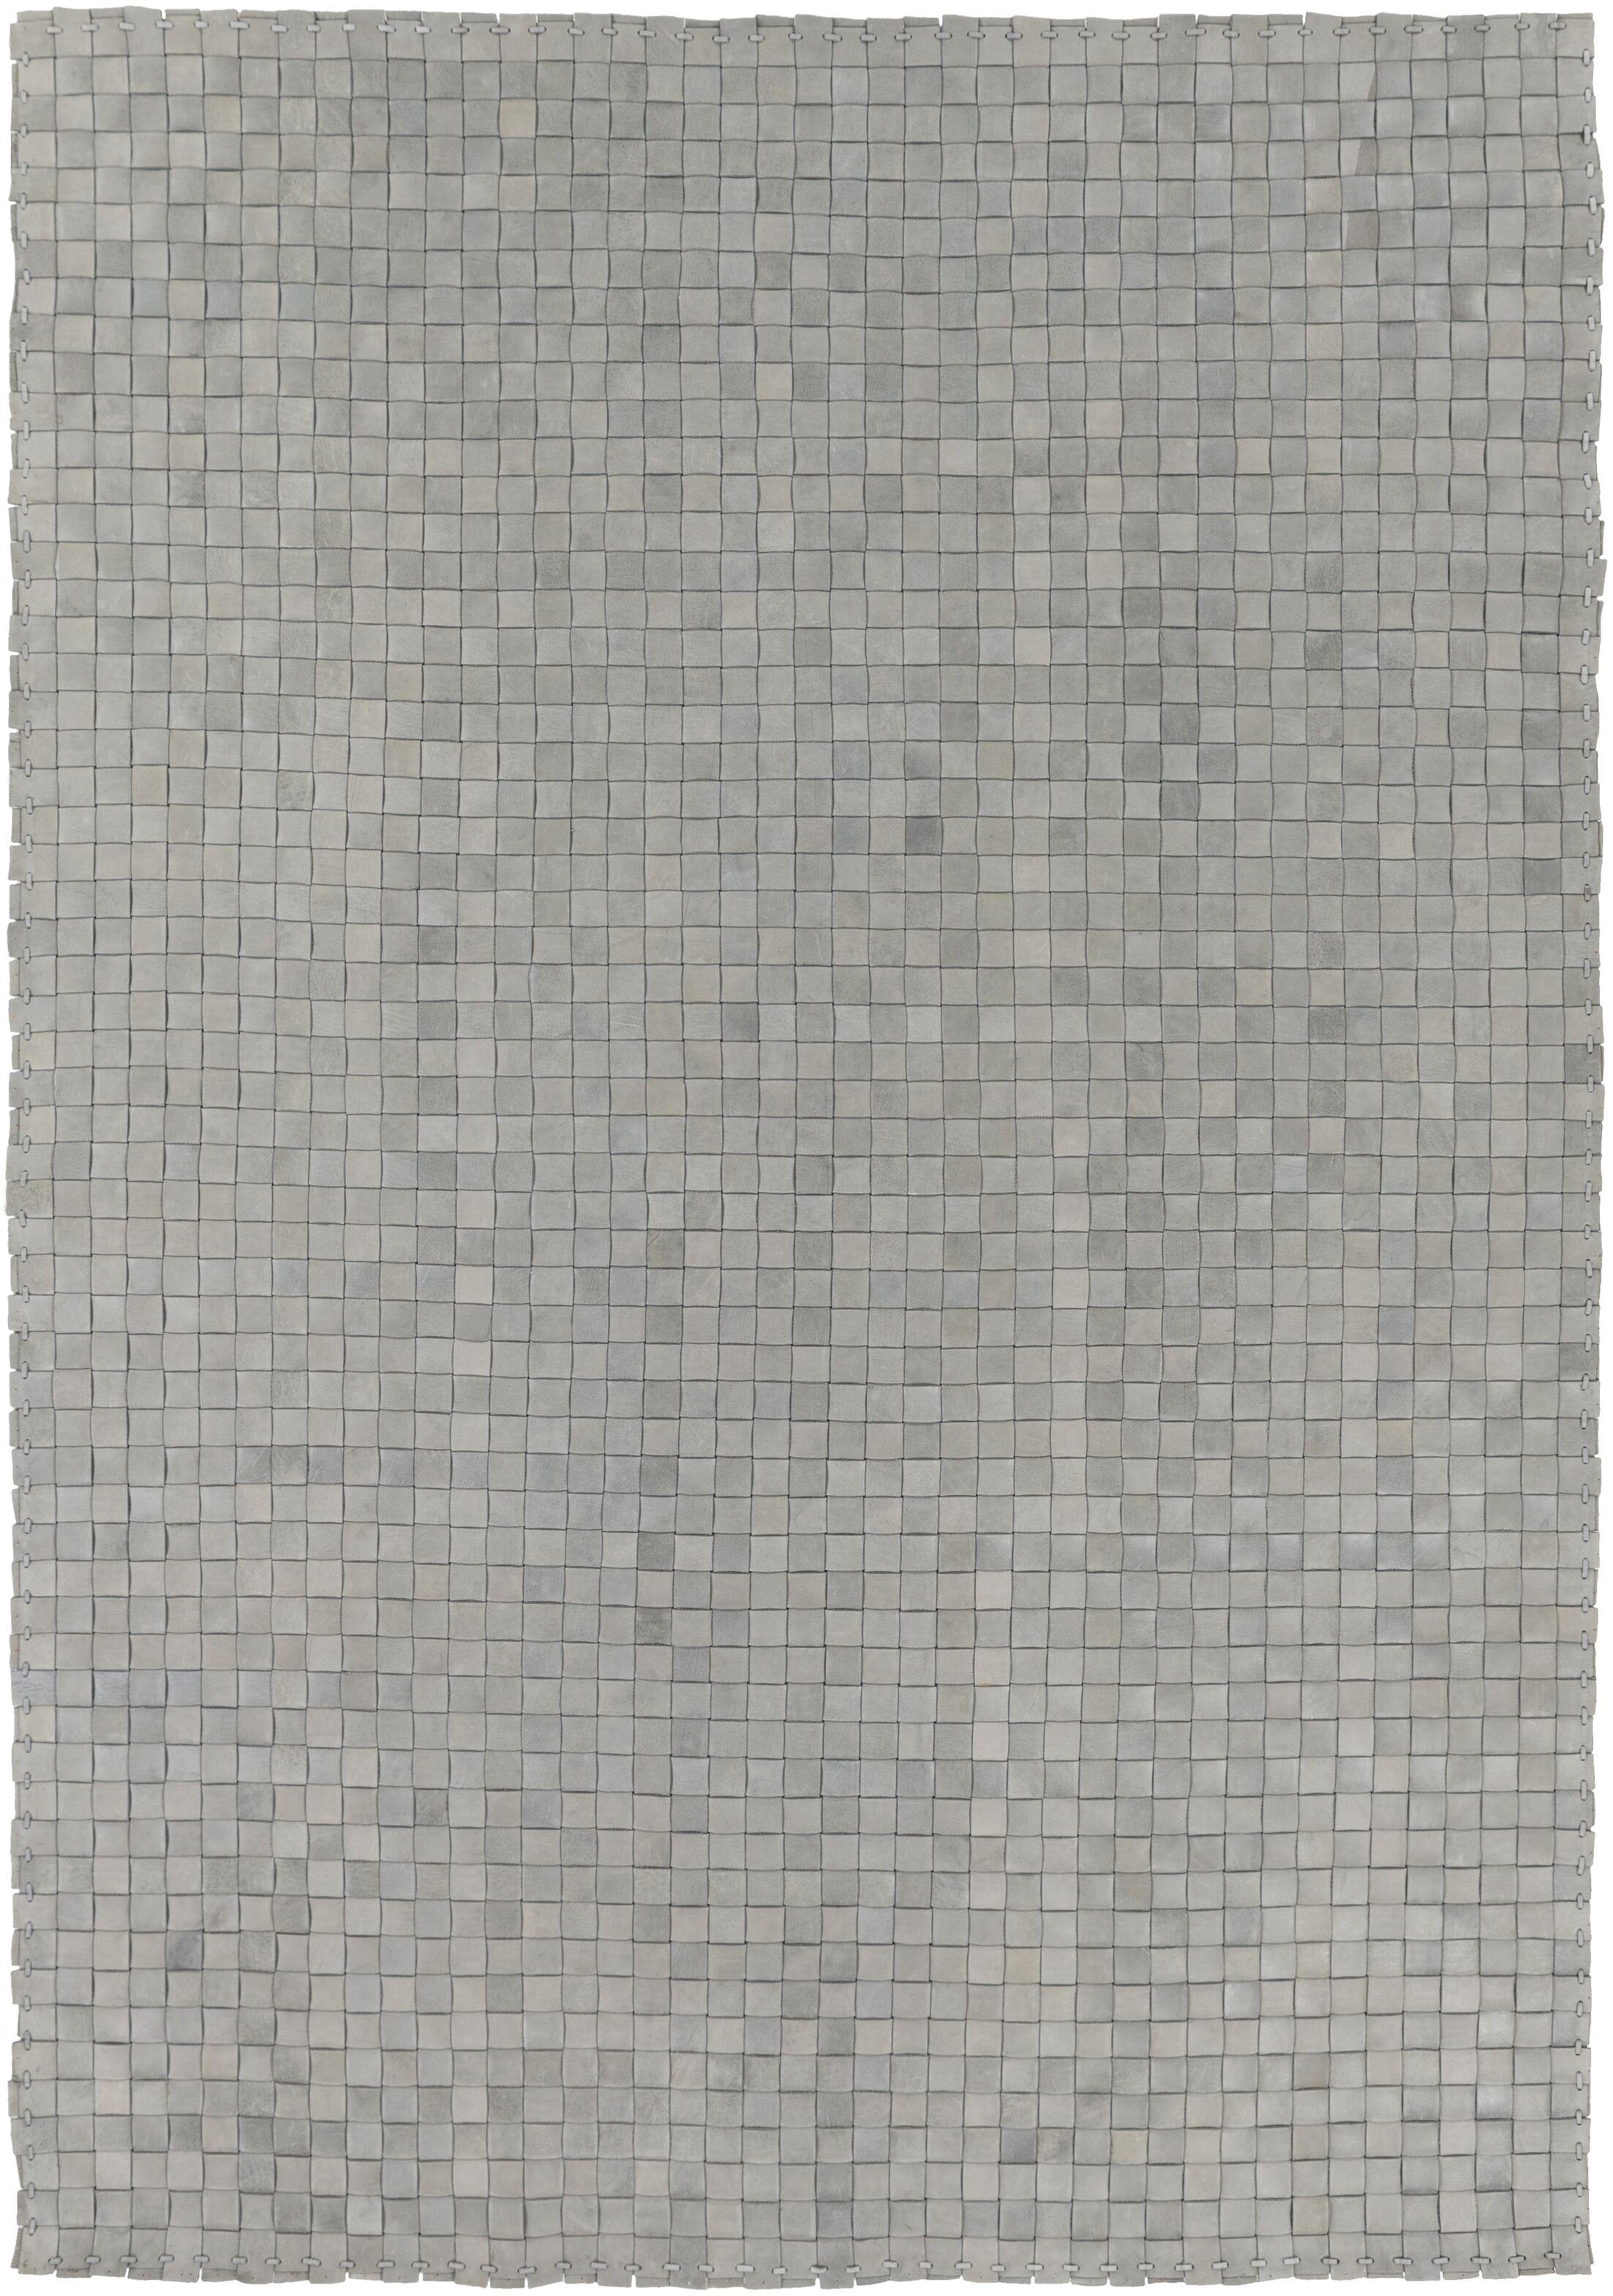 Taraji Hand Woven Gray Indoor/Outdoor Area Rug Rug Size: Rectangle 4' x 6'